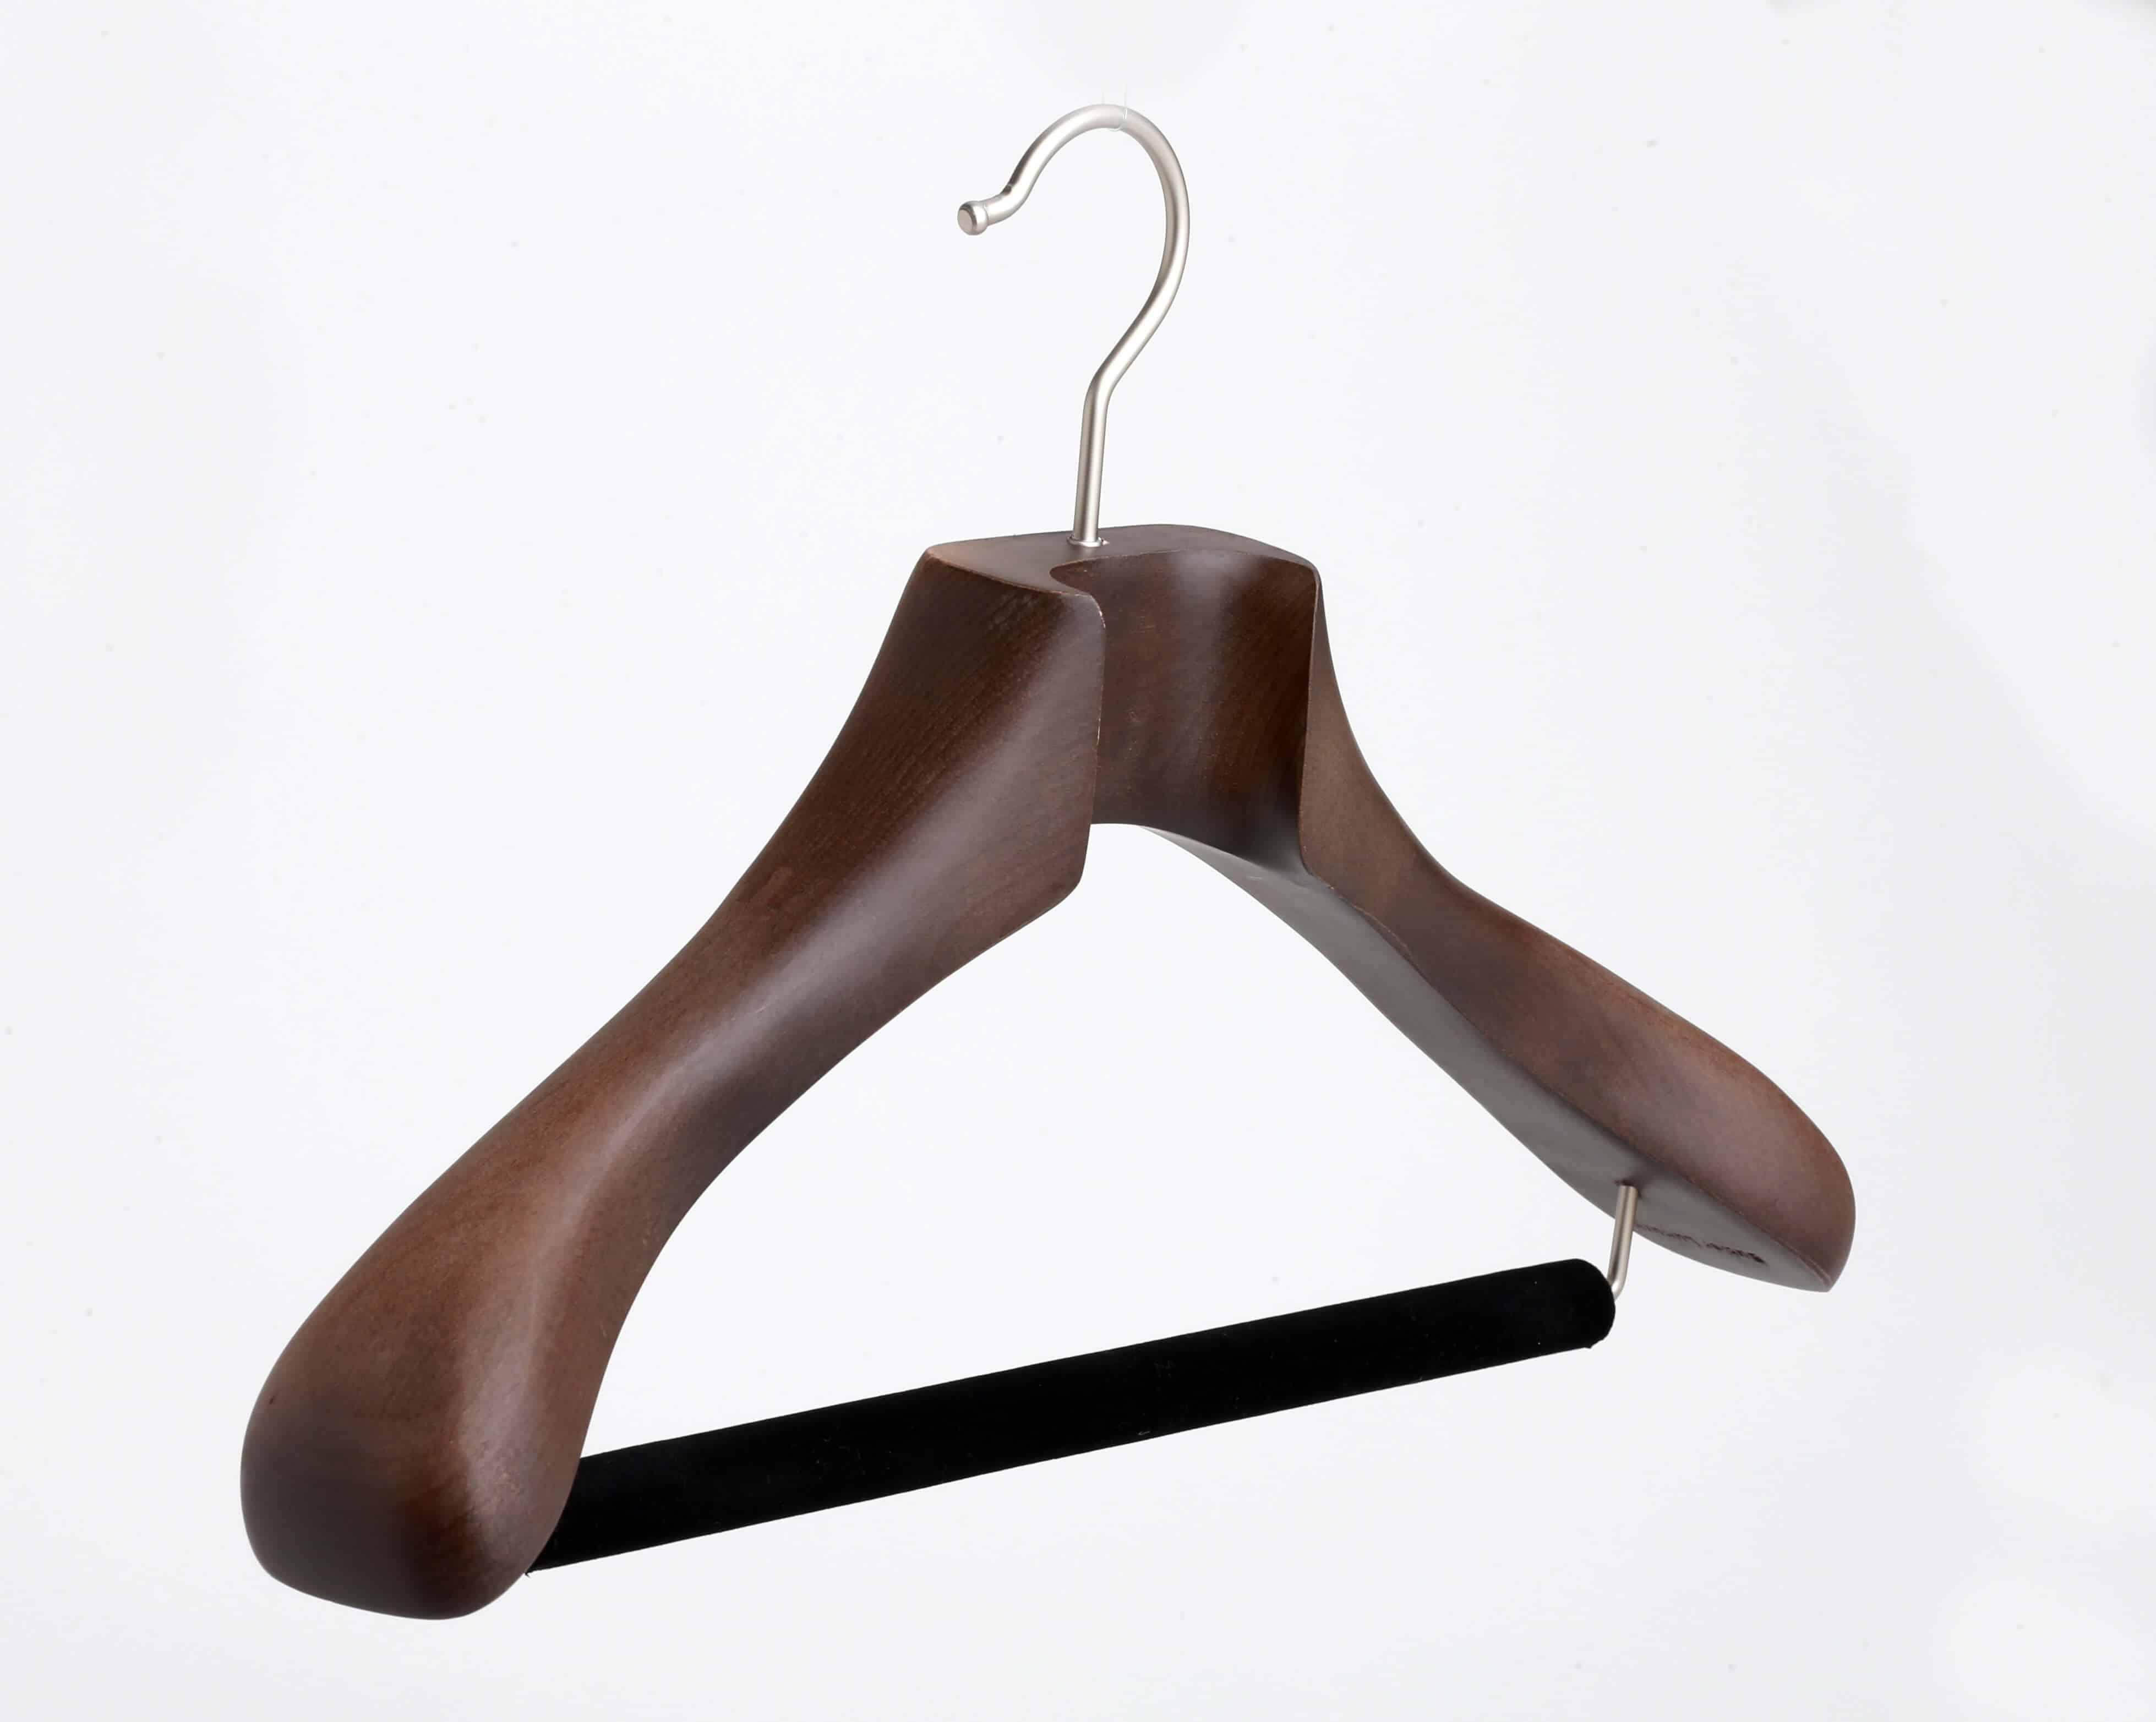 the best clothes hanger in the world gentleman 39 s gazette. Black Bedroom Furniture Sets. Home Design Ideas